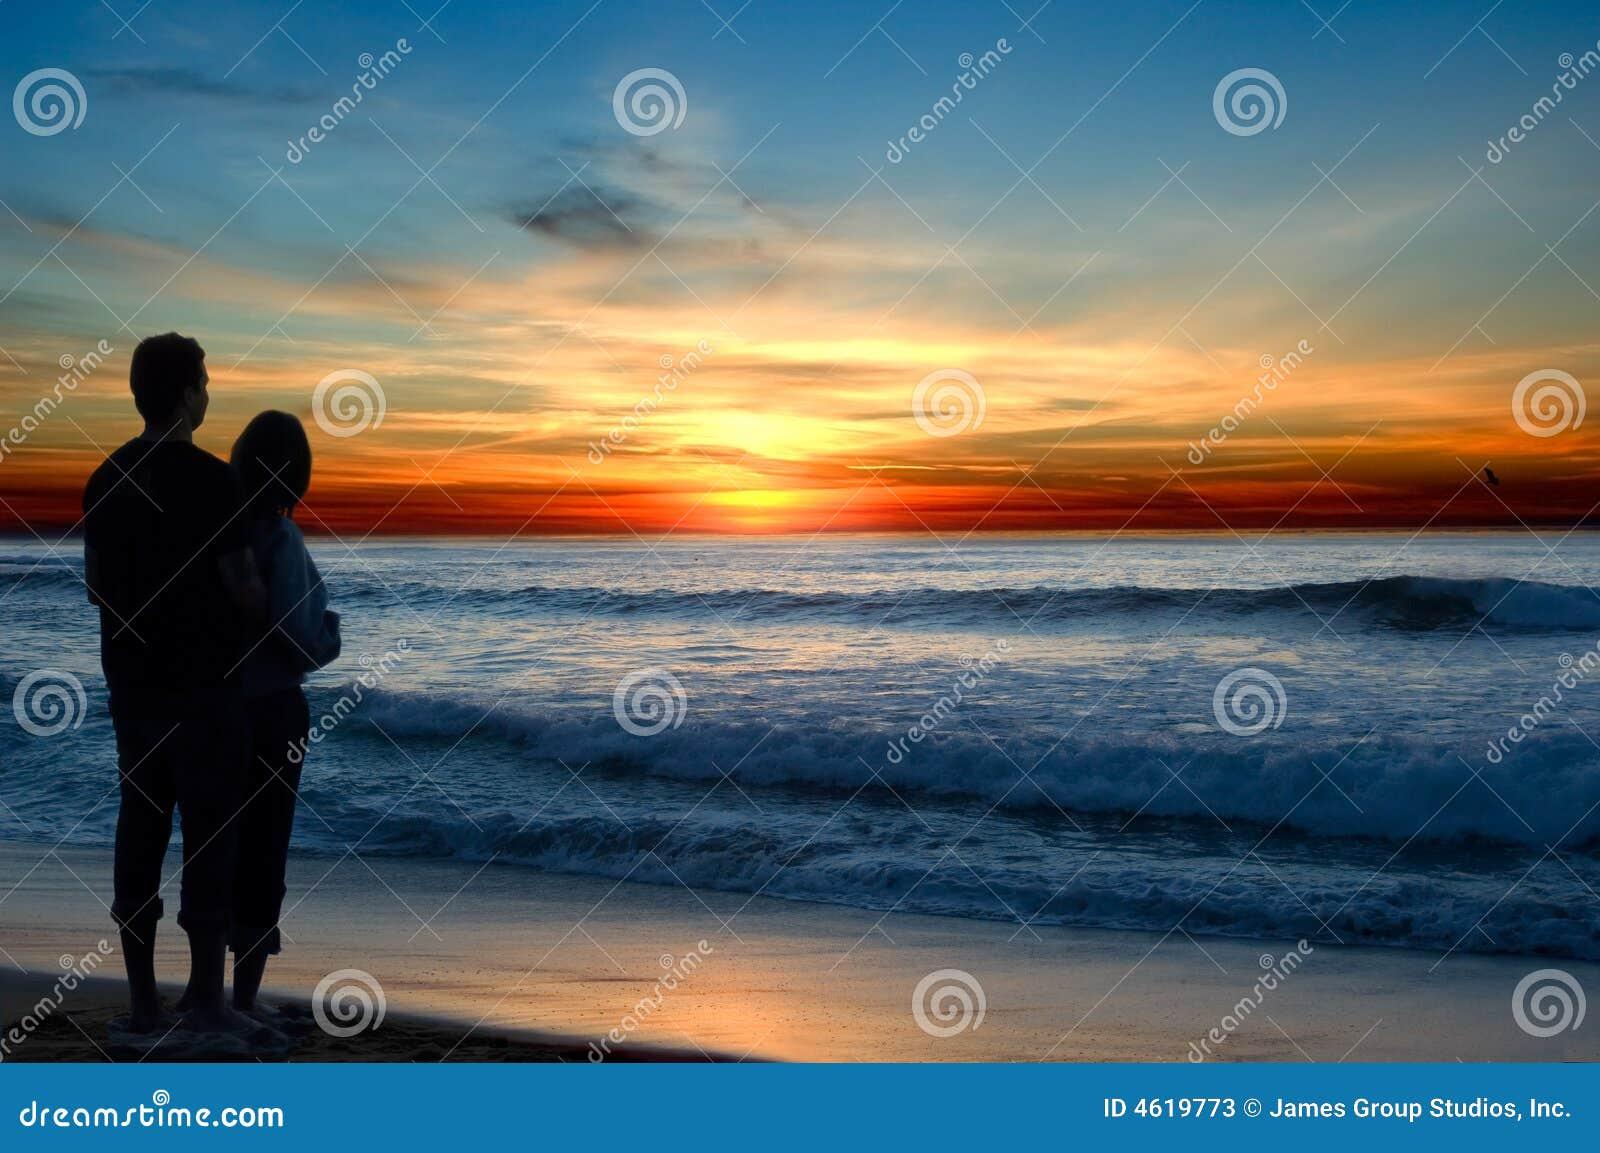 Sonnenuntergang Romance